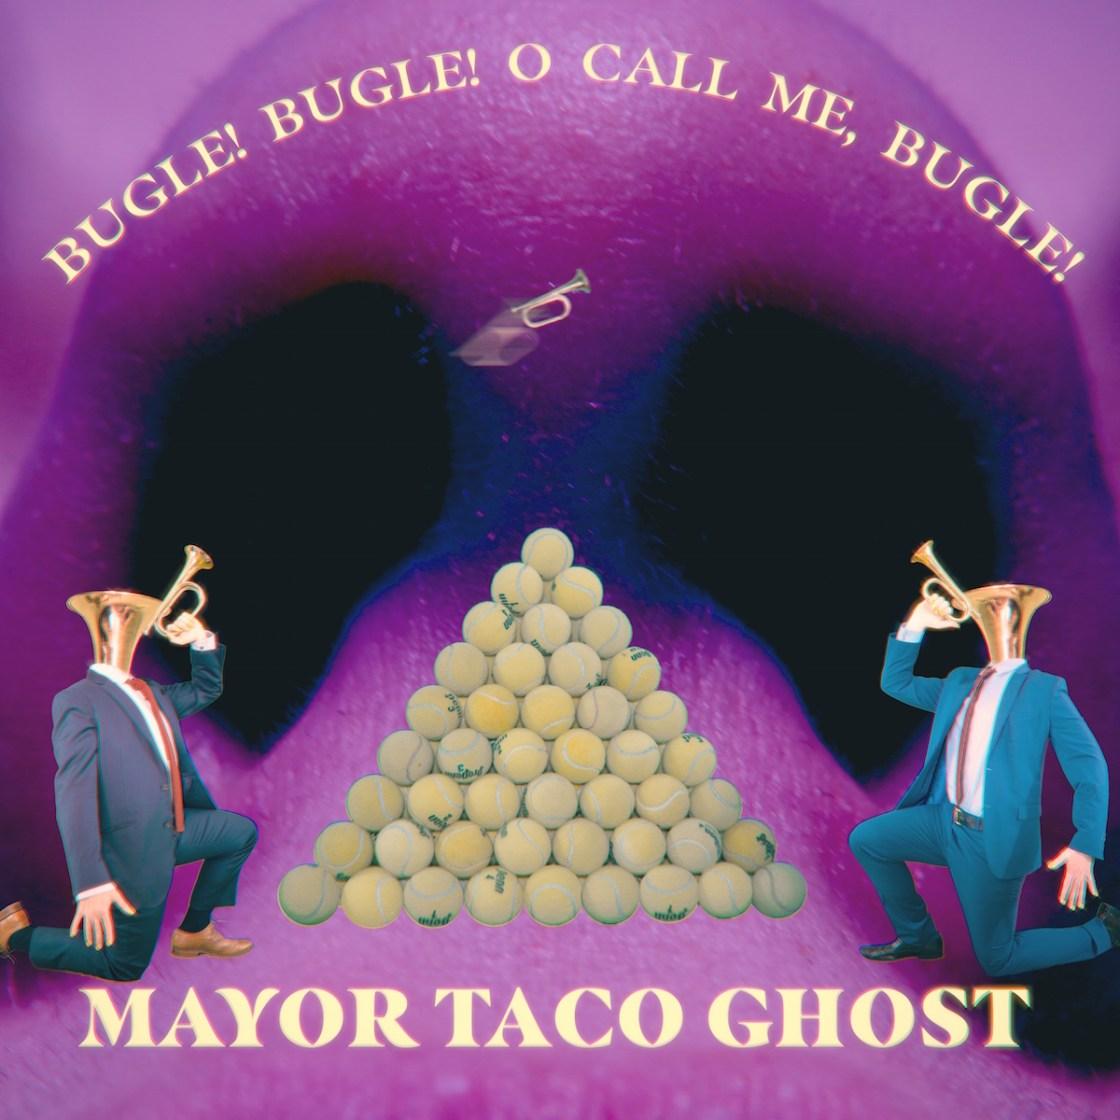 Bugle Bugle O Call Me Bugle